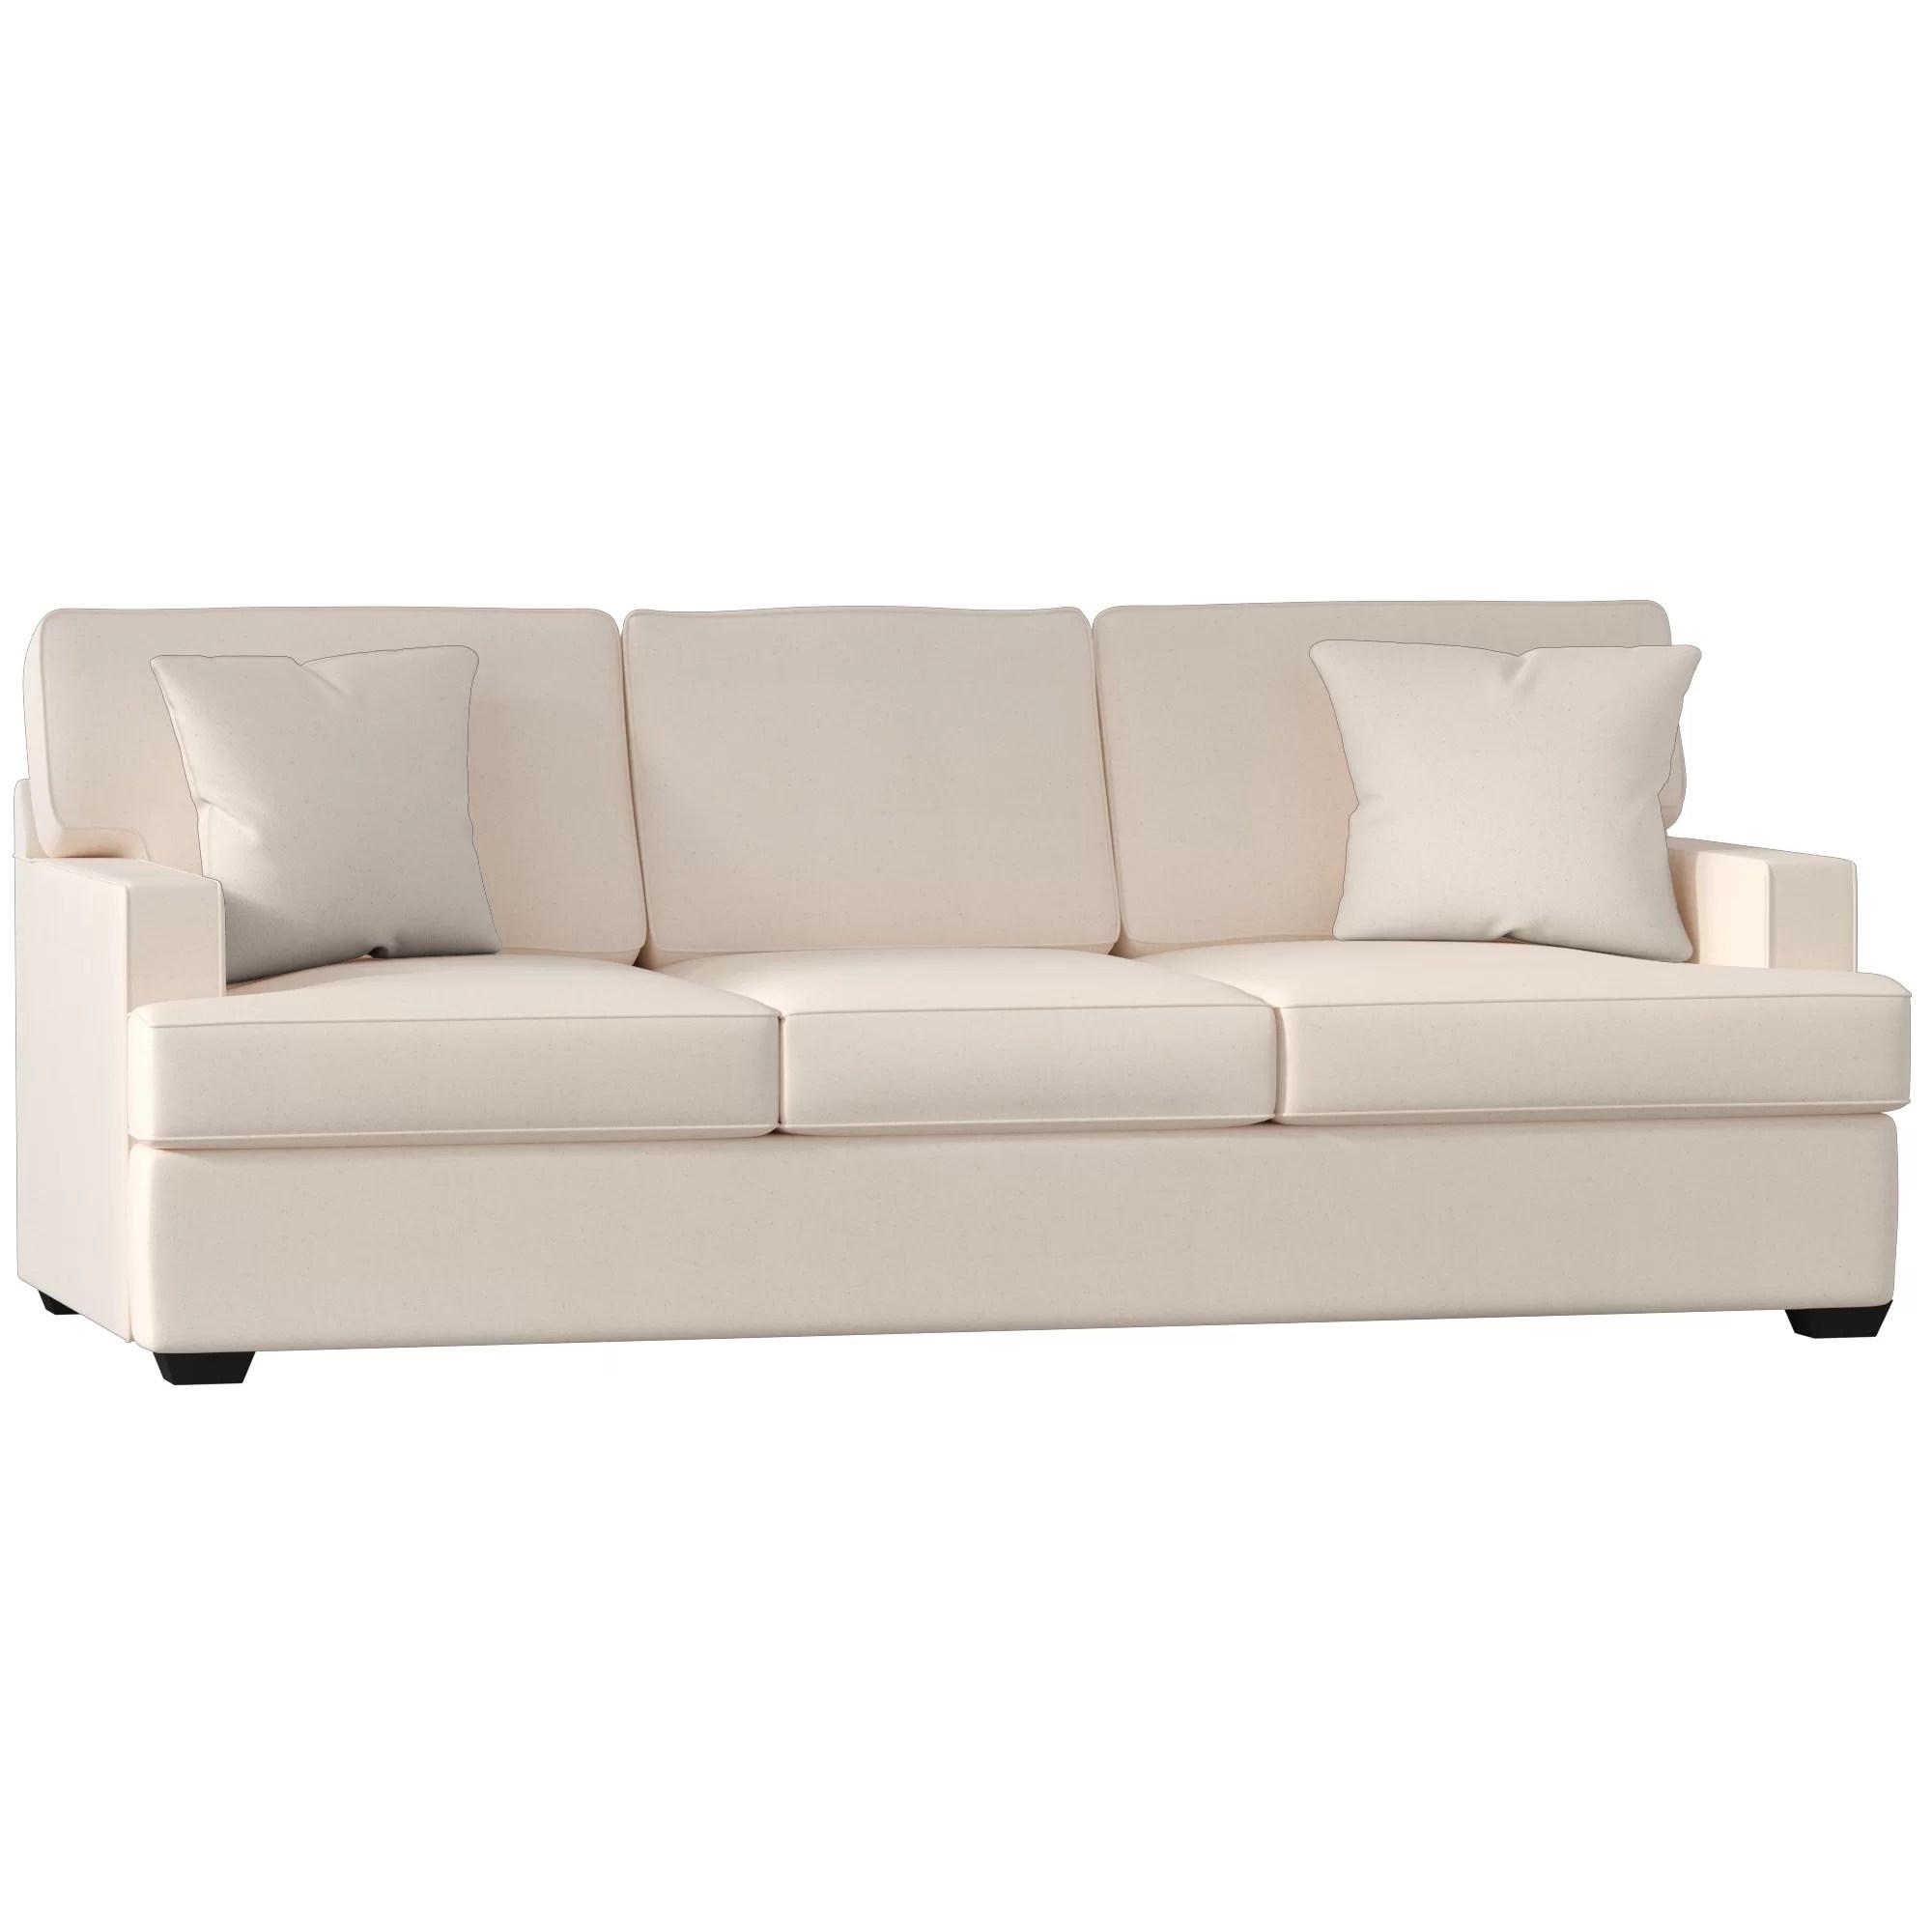 avery's chair covers and more free barber wayfair custom upholstery avery sleeper sofa reviews